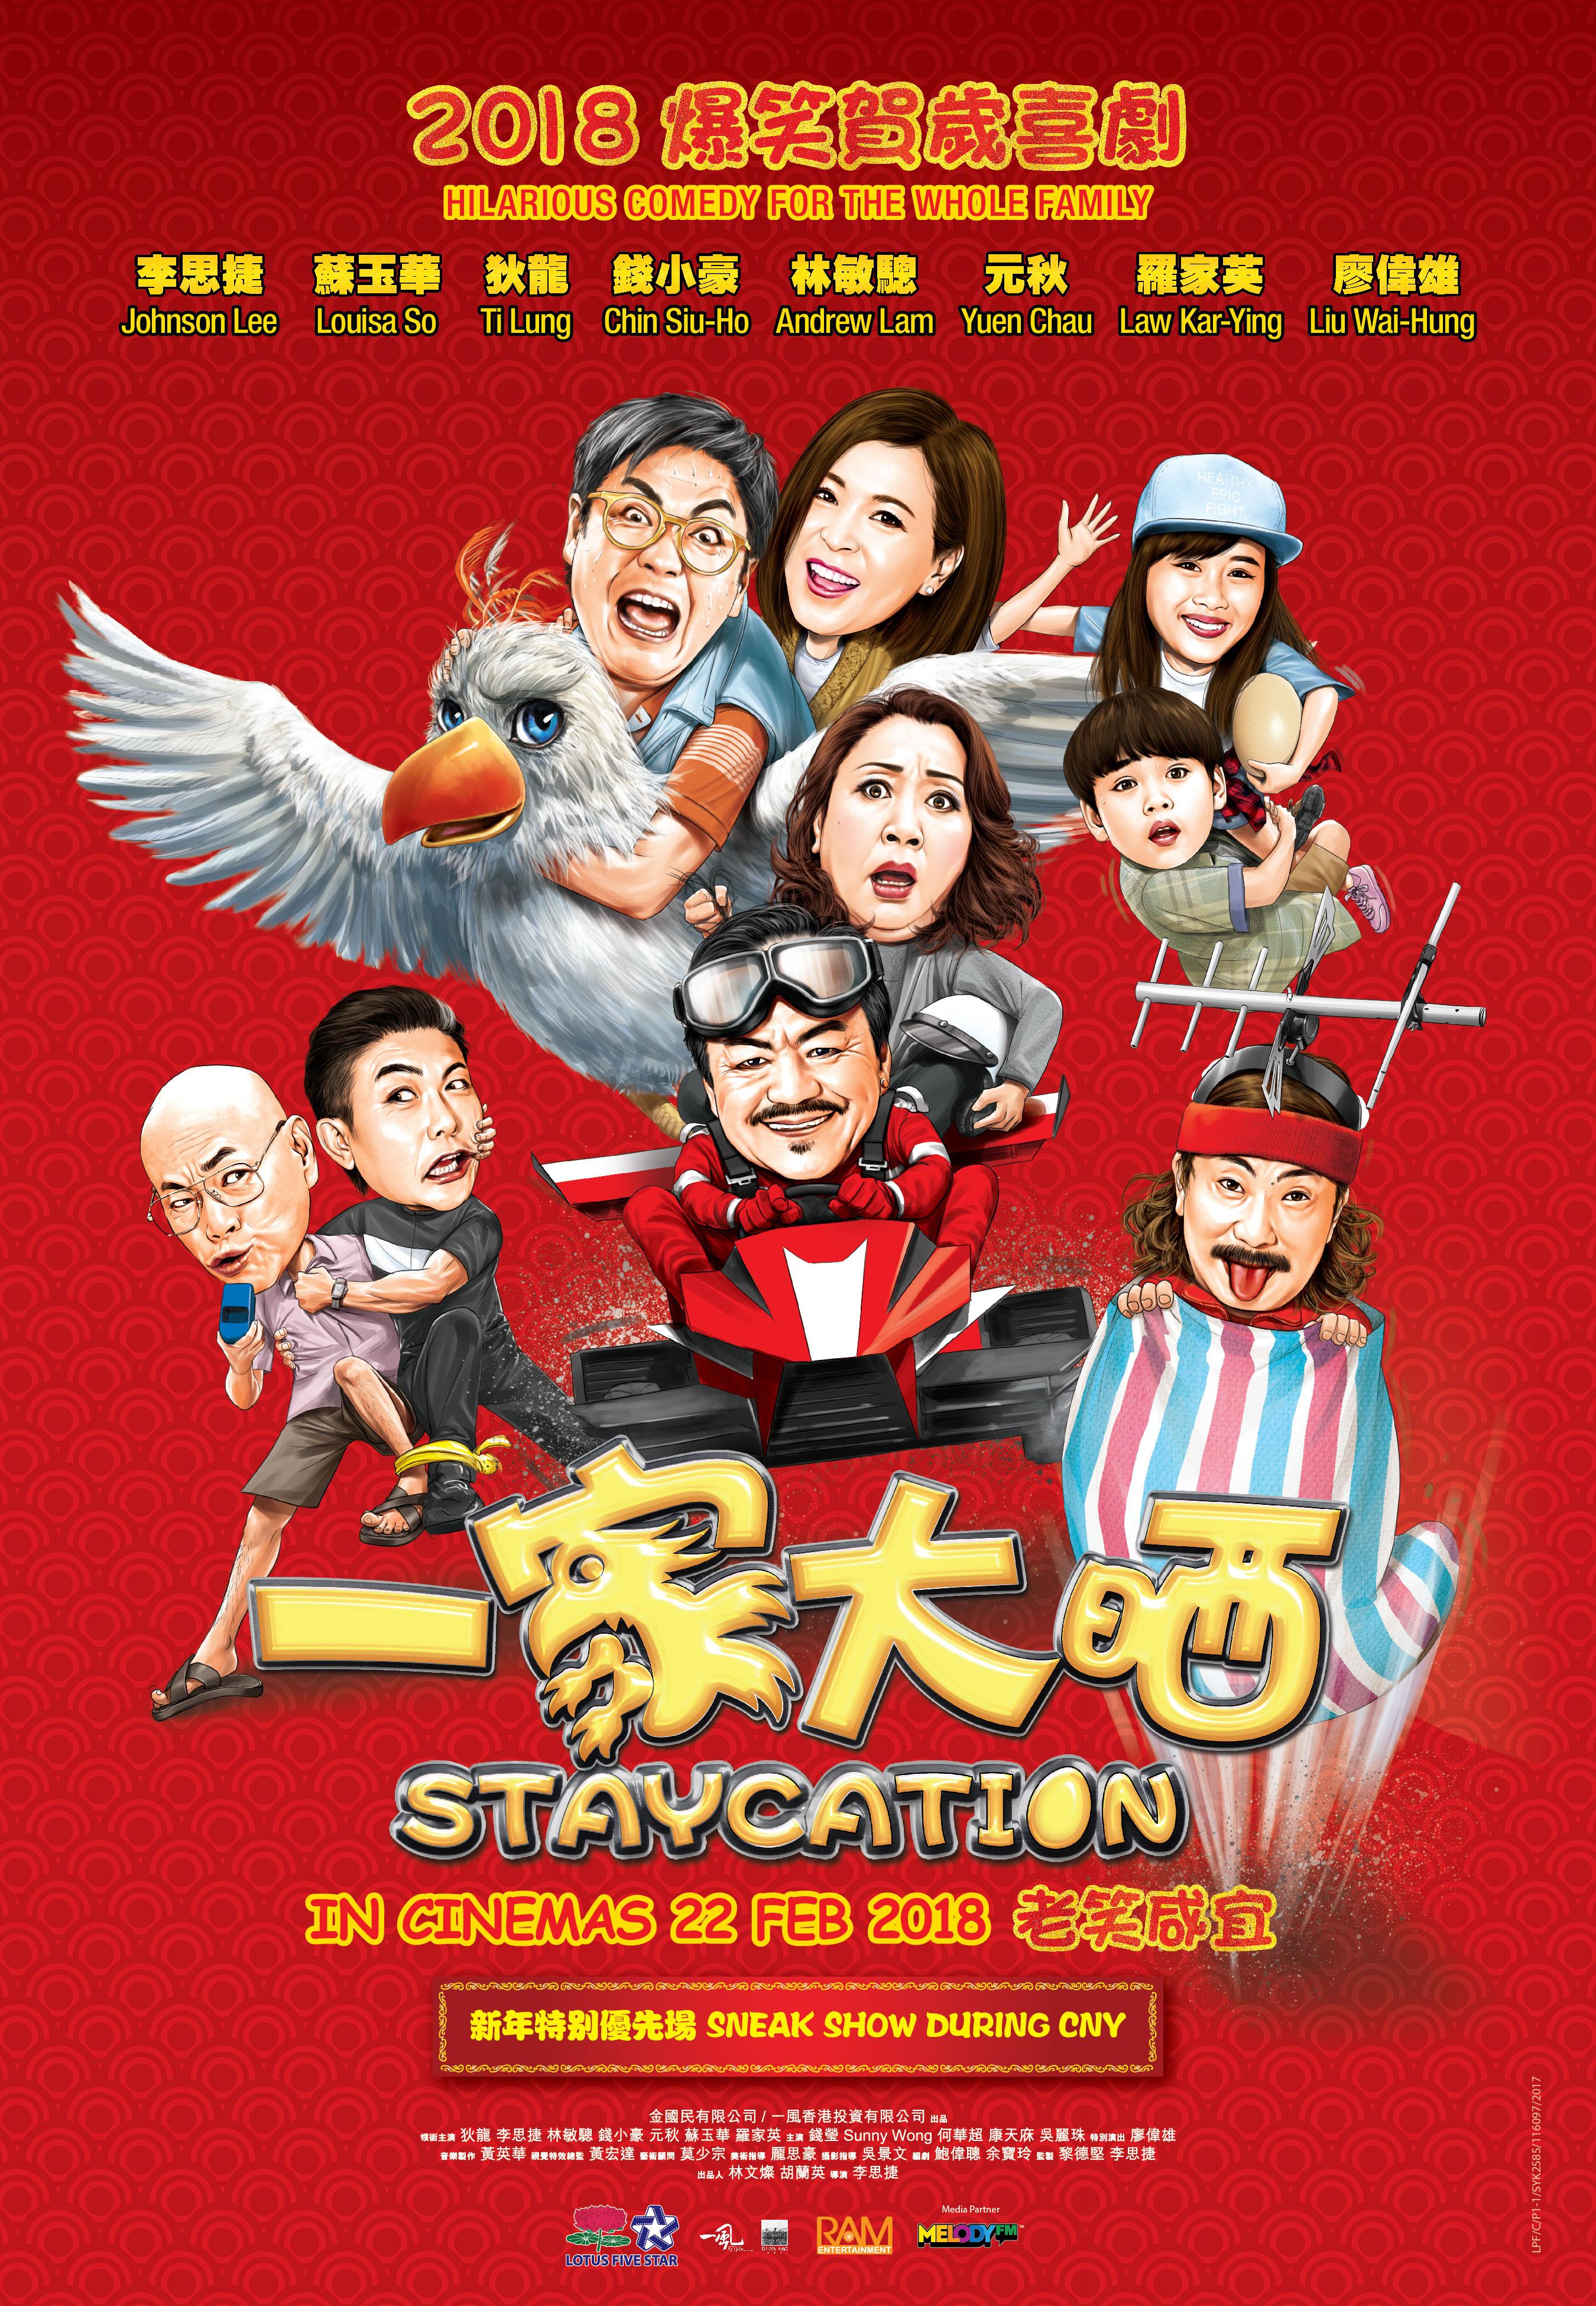 Staycation <br/> 一家大晒 <br/> 22 February 2018